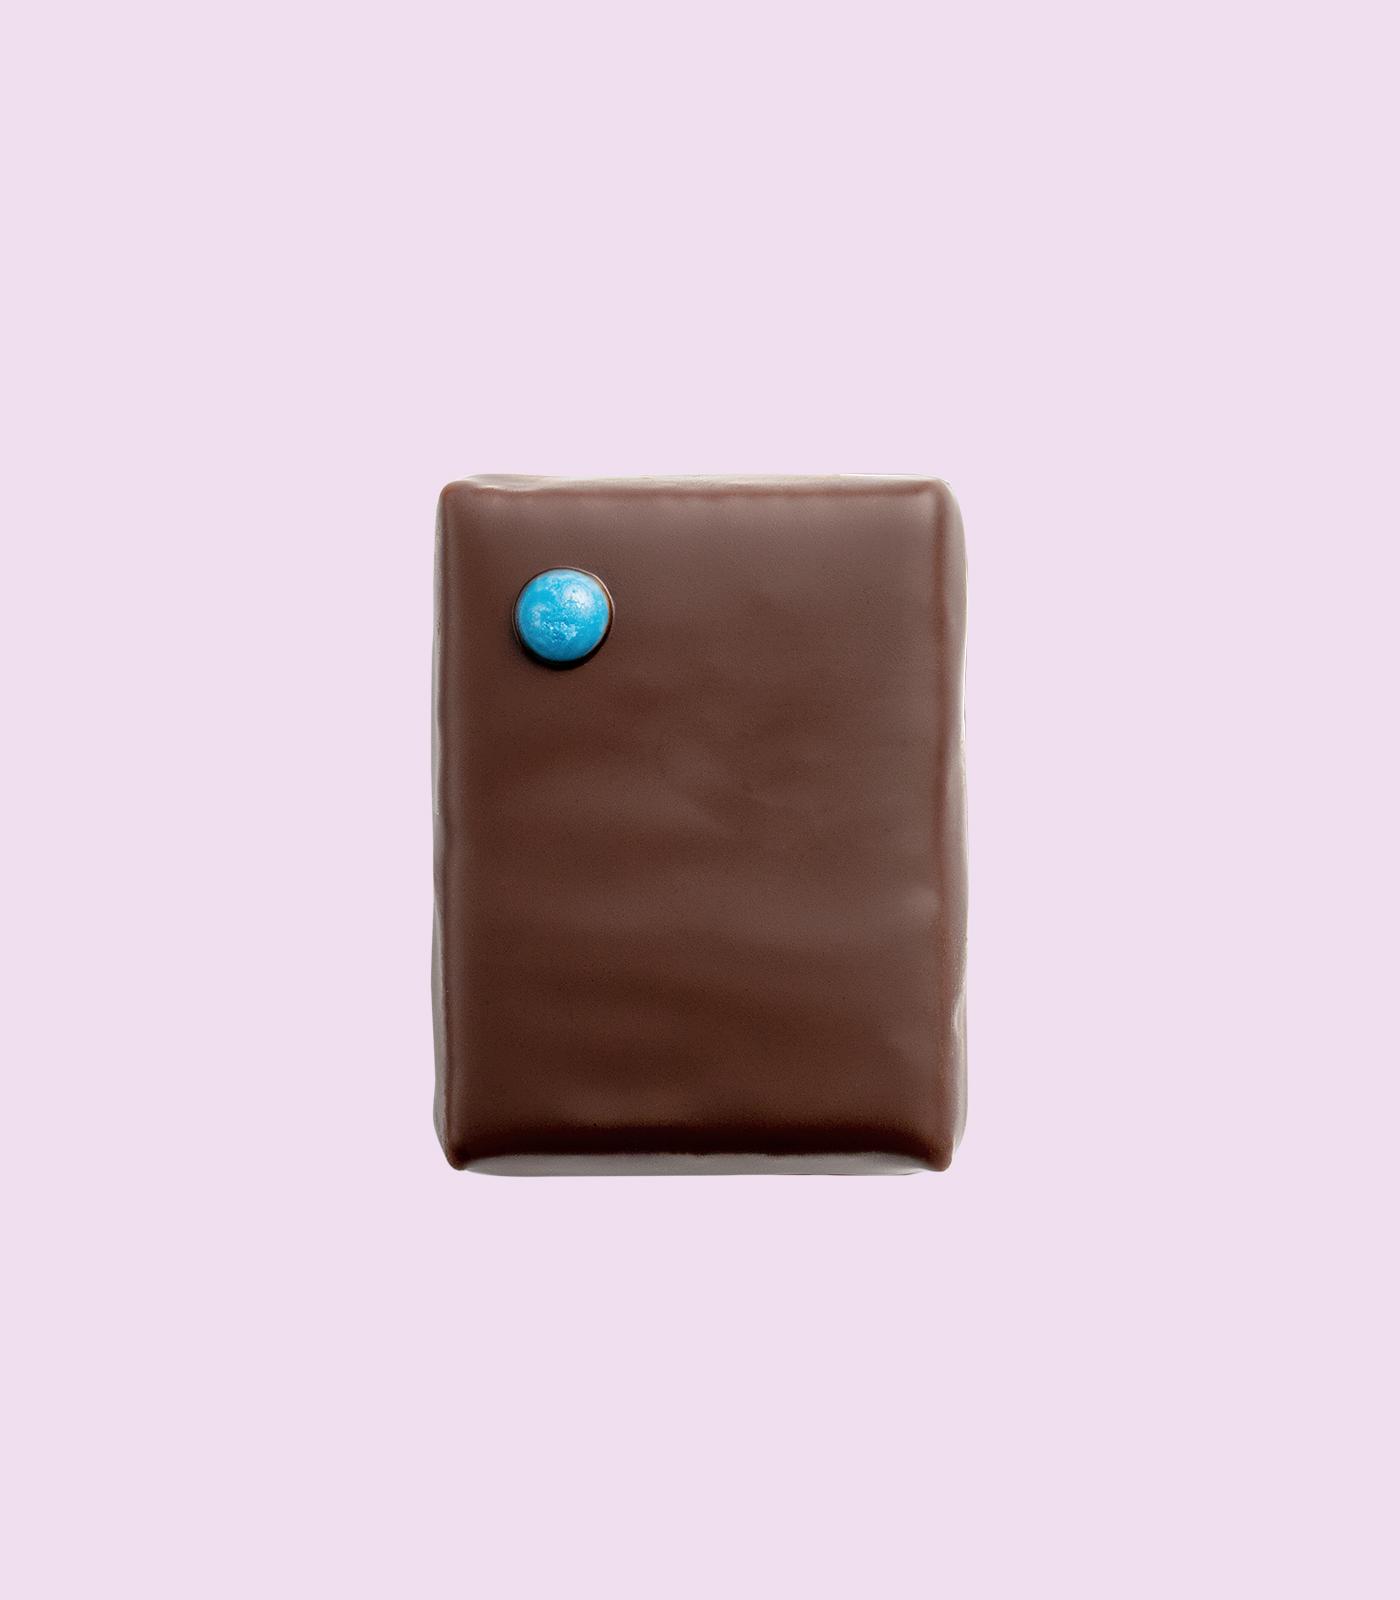 ganache ARRIBA, ondes de choc, Craponne, chocolatier